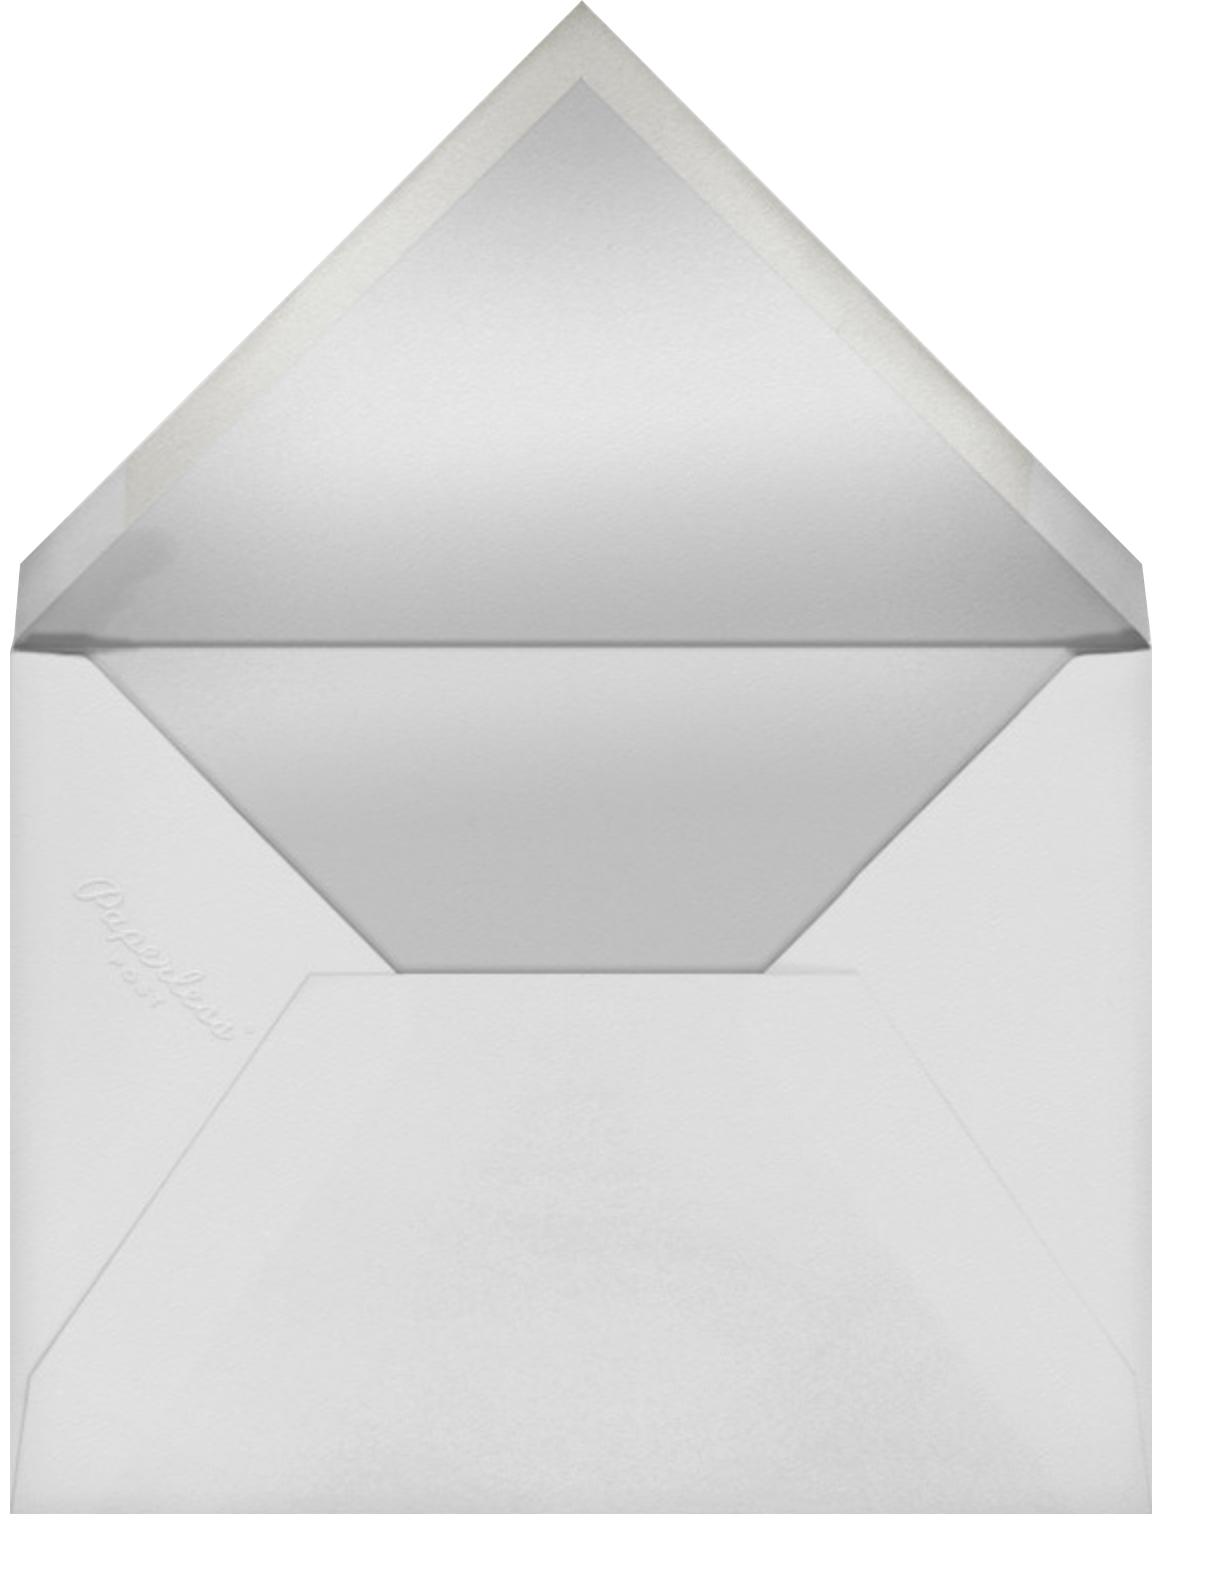 Medal - Blood Orange - Paperless Post - Father's Day - envelope back